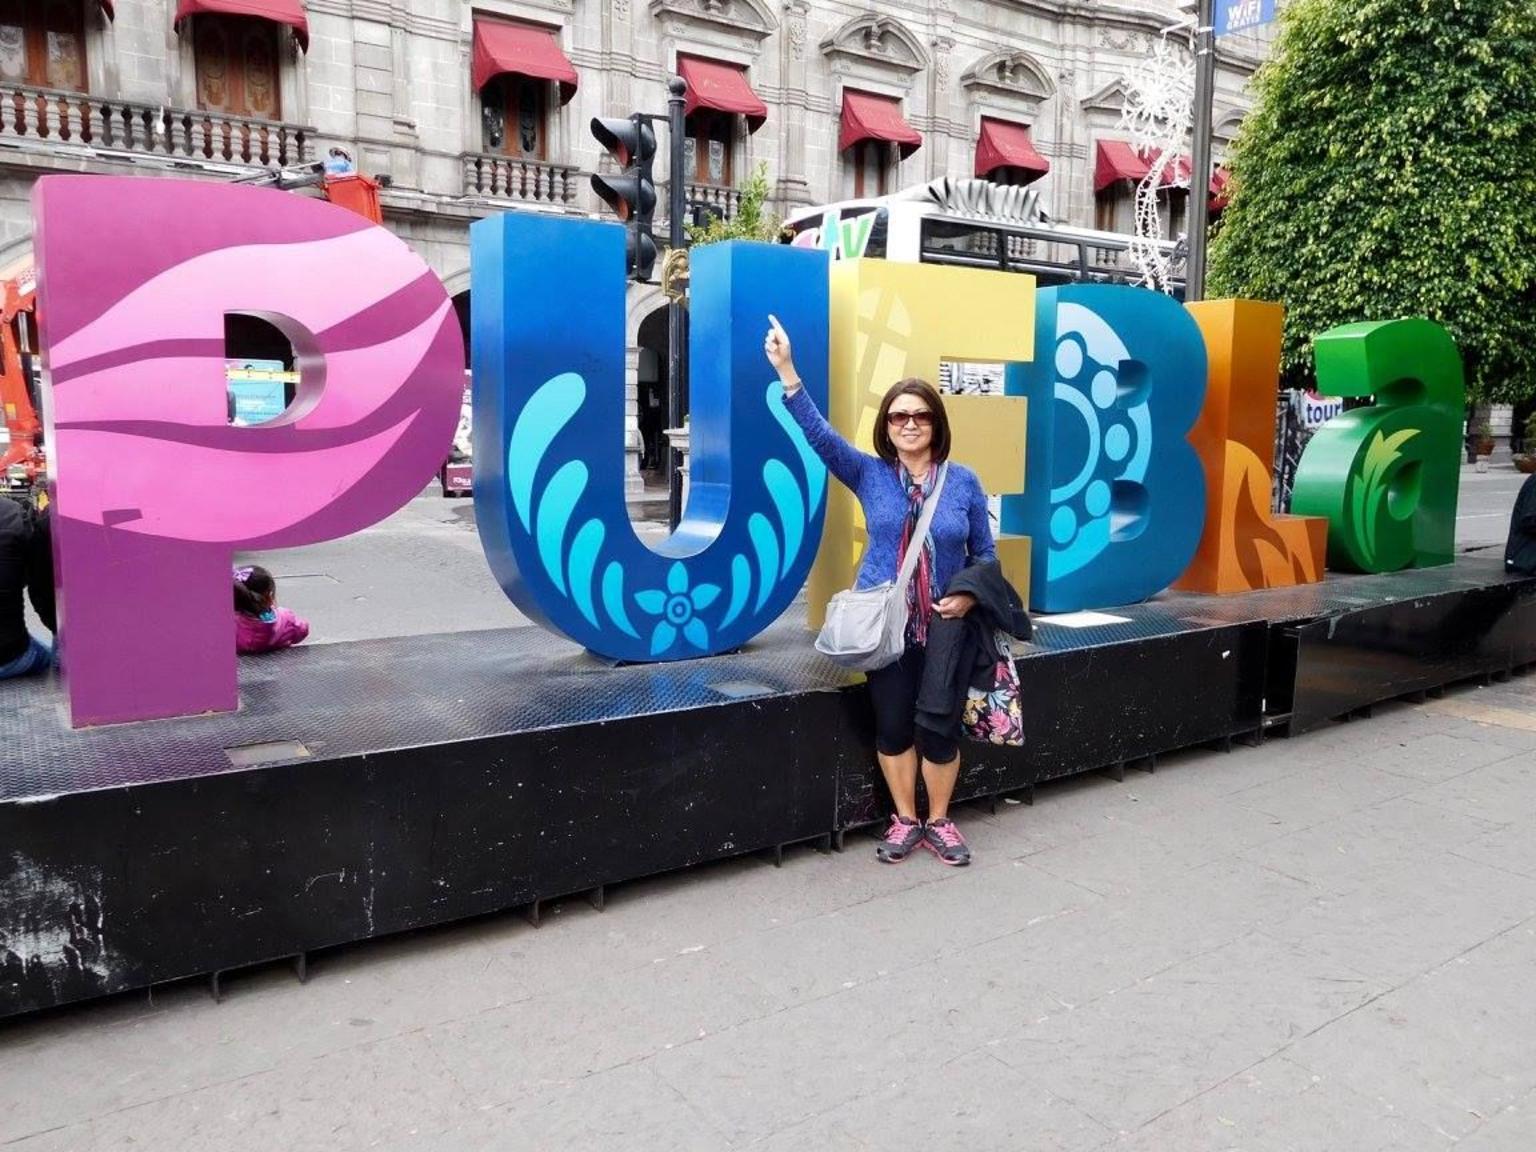 MORE PHOTOS, Mexico City Super Saver: Puebla and Cholula Plus Taxco and Cuernavaca Day Trips